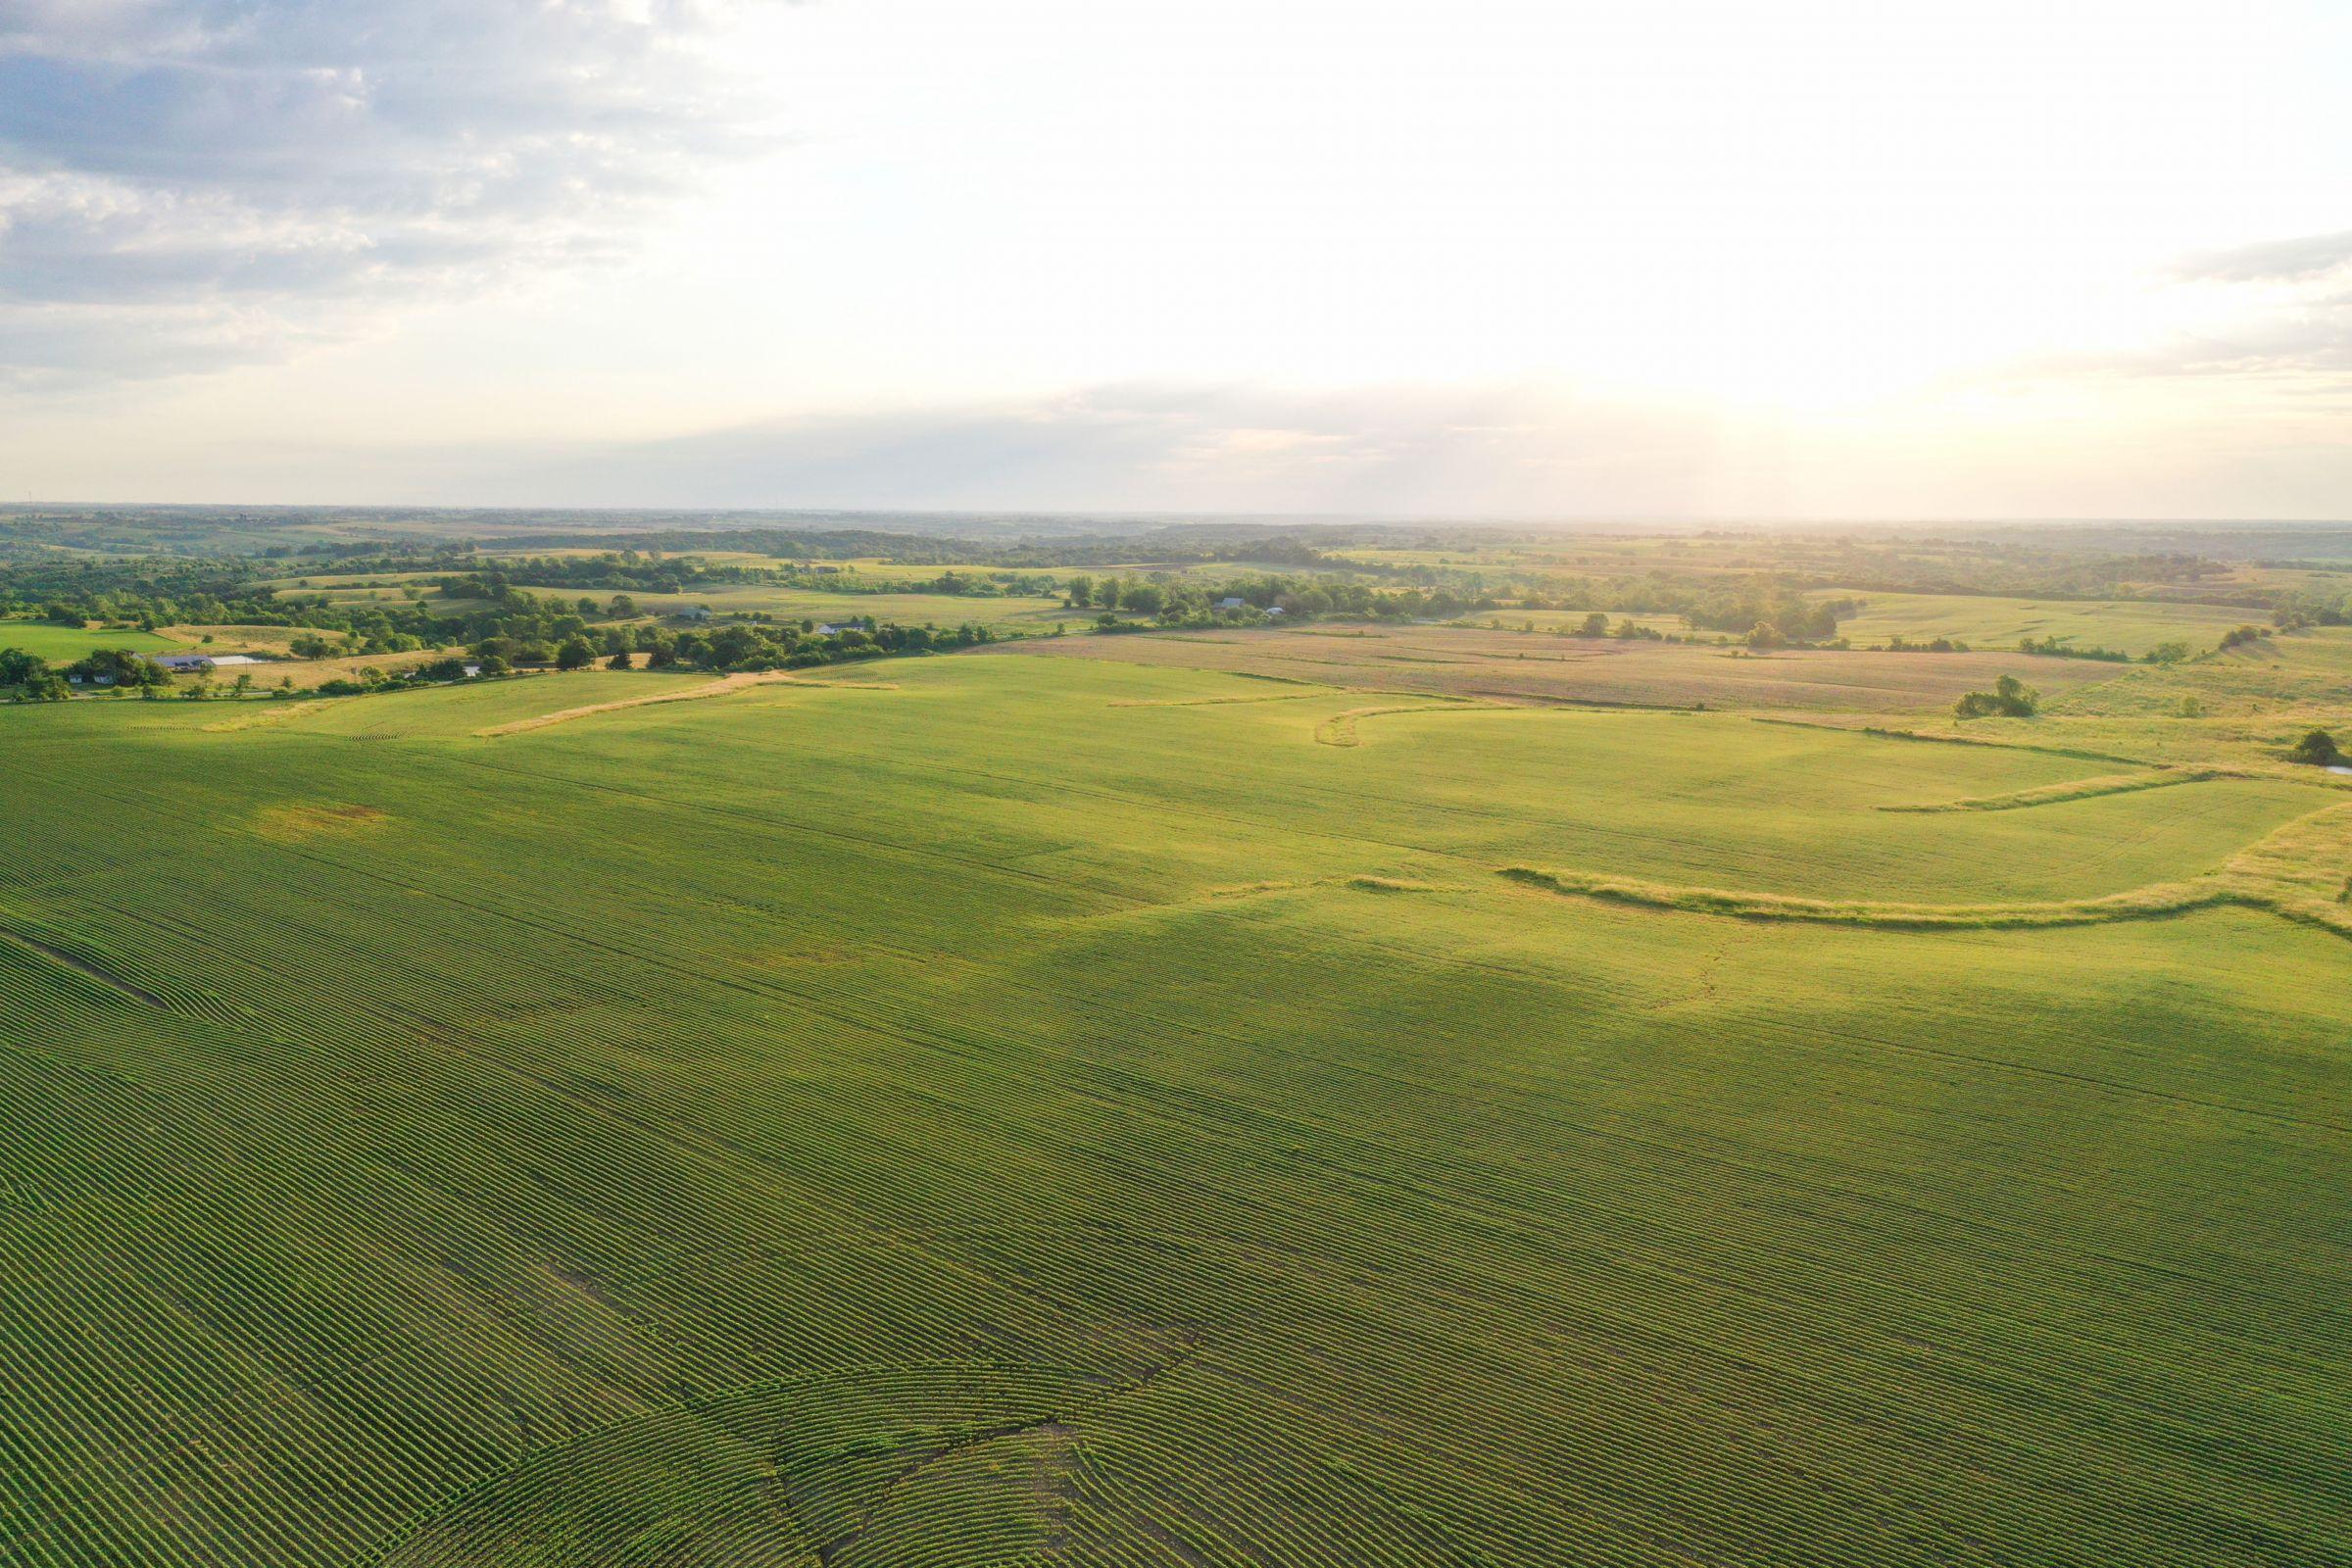 land-clarke-county-iowa-883-acres-listing-number-15596-3-2021-06-23-163313.jpg